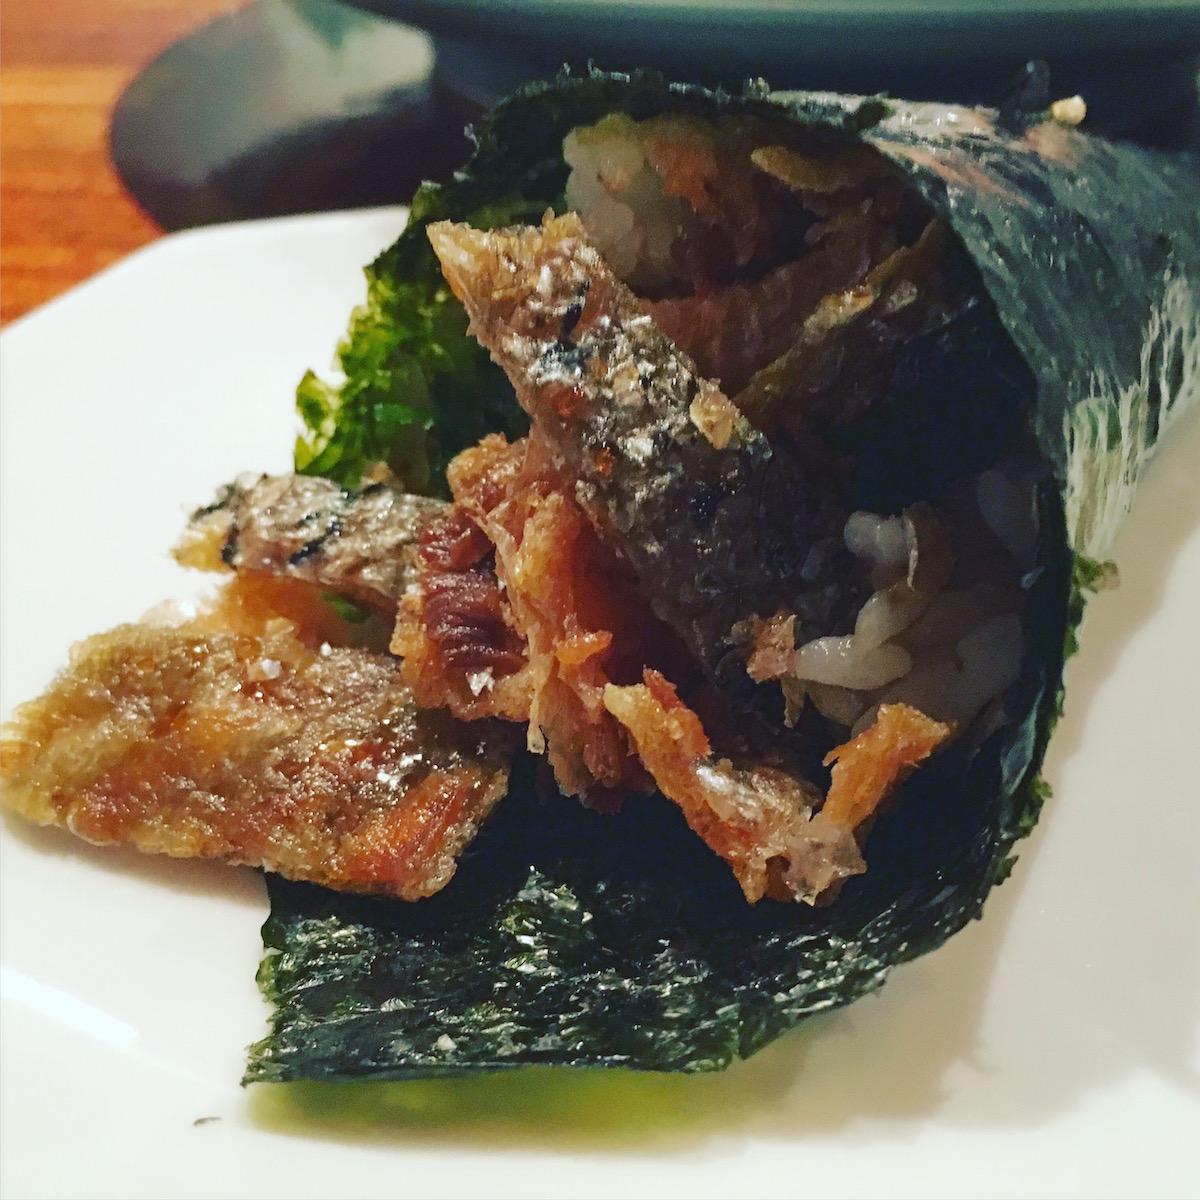 Toni's Sushi Bar - sake cava temaki